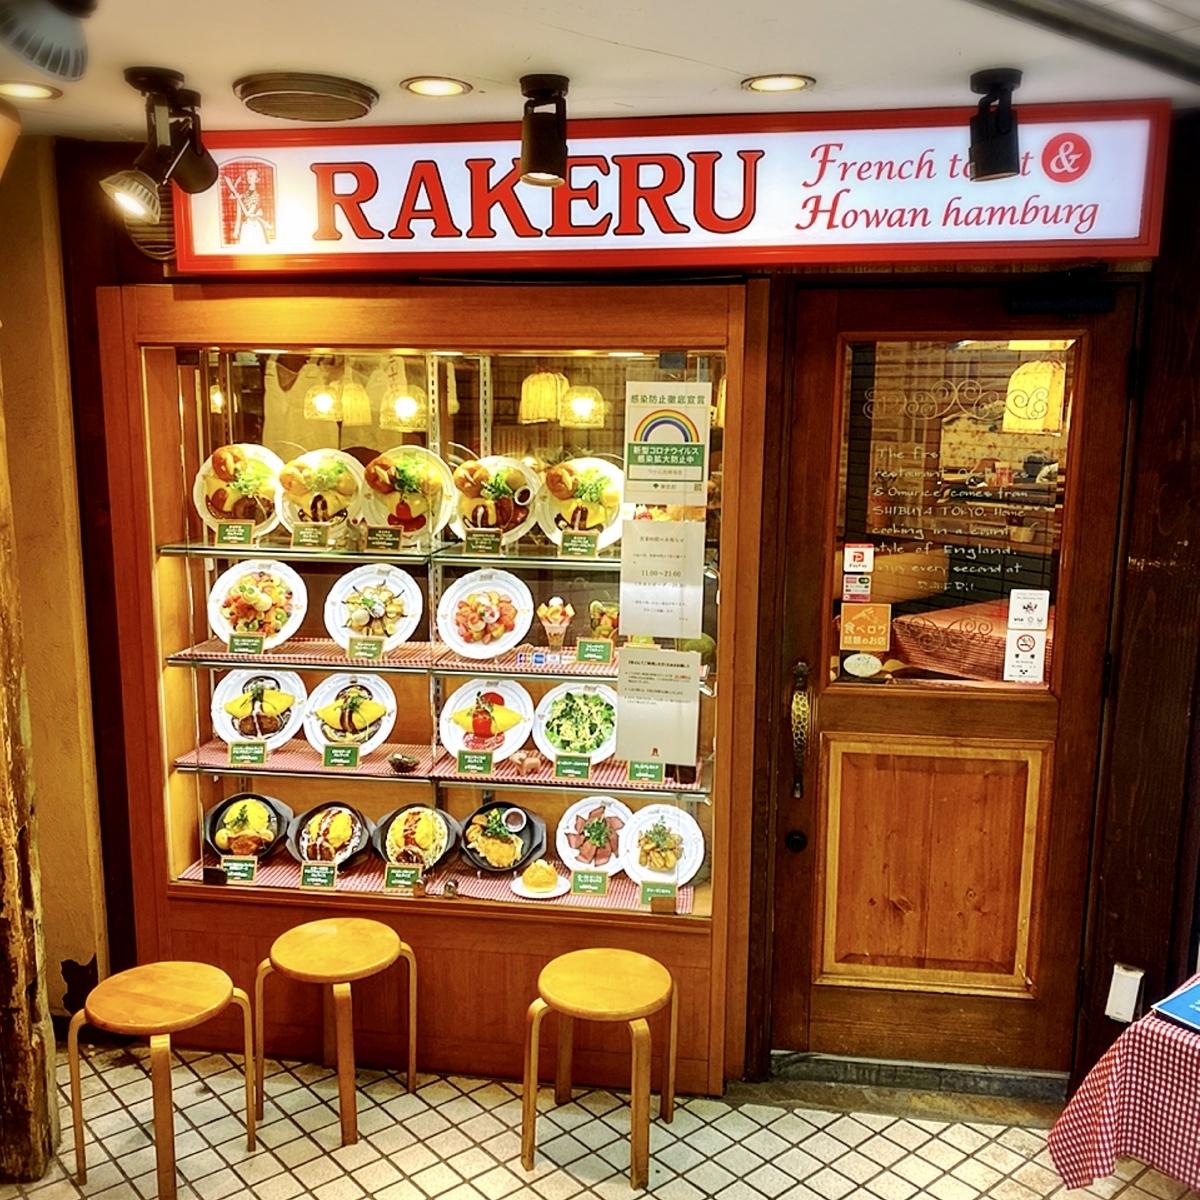 「RAKERU(ラケル)吉祥寺店」はご家族から一人ご飯にもおすすめできるオムライス特化の洋食屋